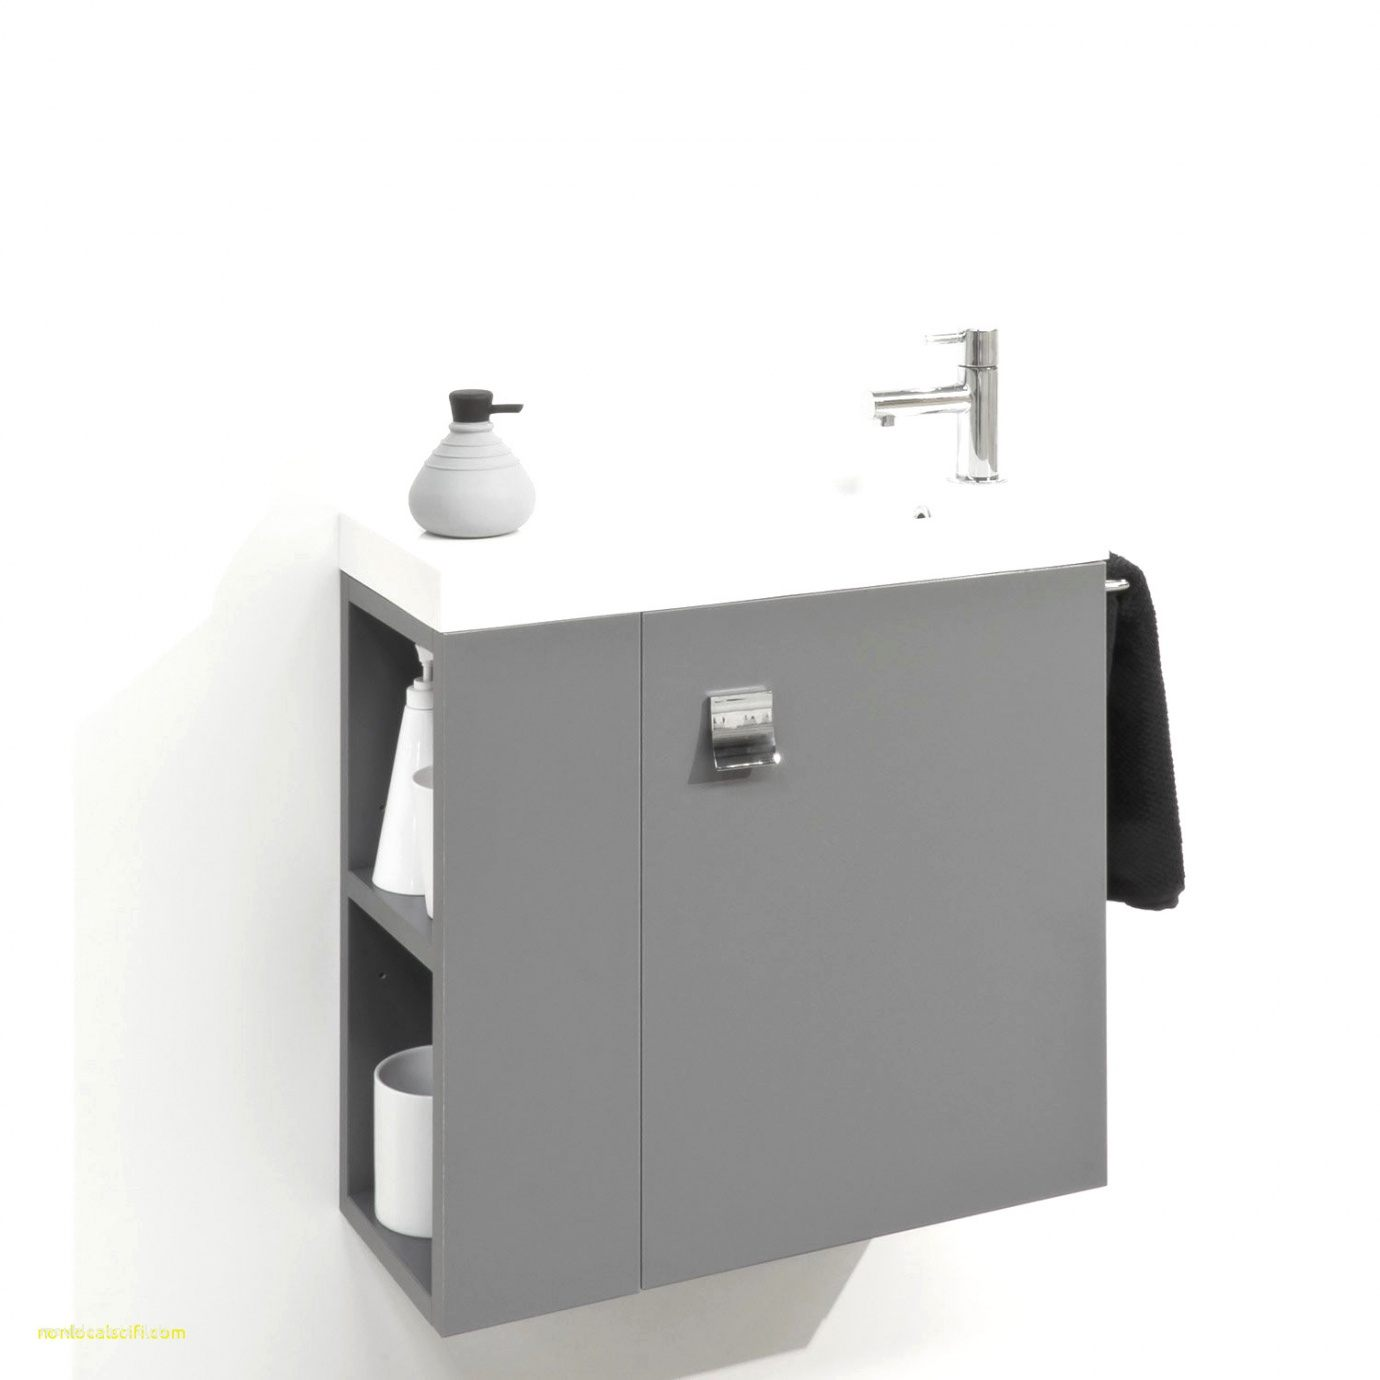 Lit Mezzanine Avec Bureau Intégré Conforama Inspirant Armoire Bureau Intégré Awesome 60 Luxe Armoire De toilette Bri Archƒ